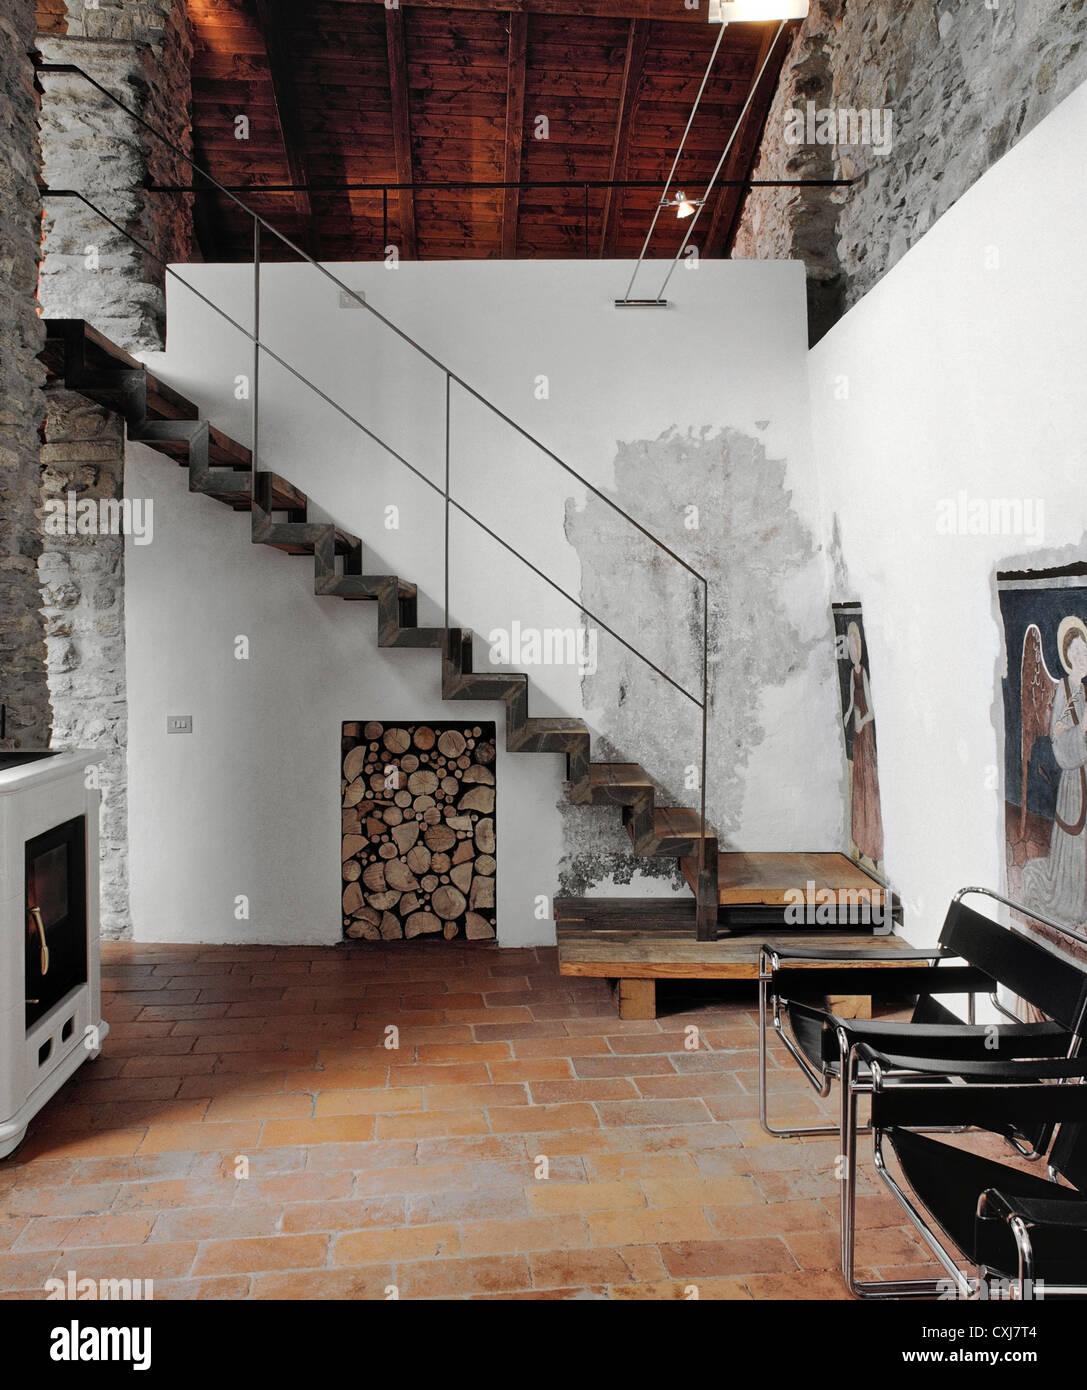 Moderne Treppe In Die Rustikale Stube Mit Terrakotta Böden Stockfoto